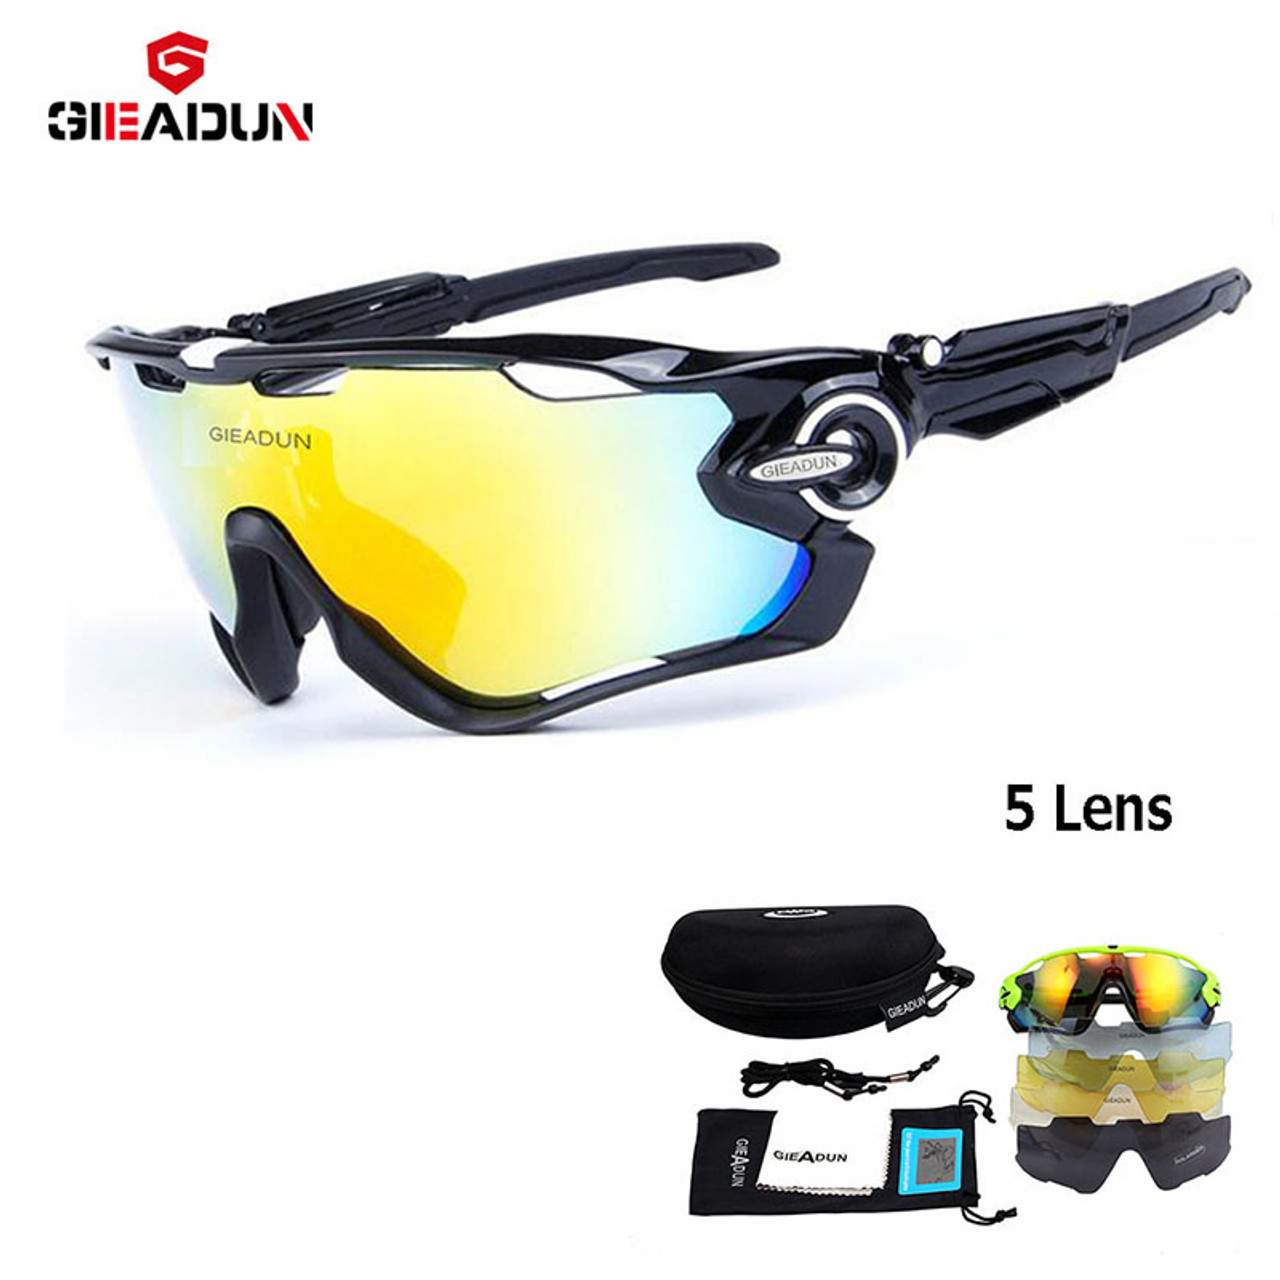 2e7f5e4618 2018 cycling Glasses 5 Lens MTB bicycle sport bike sunglasses new Outdoor  sunglasses and Polarized pesca glasses fishing glasses - OnshopDeals.Com